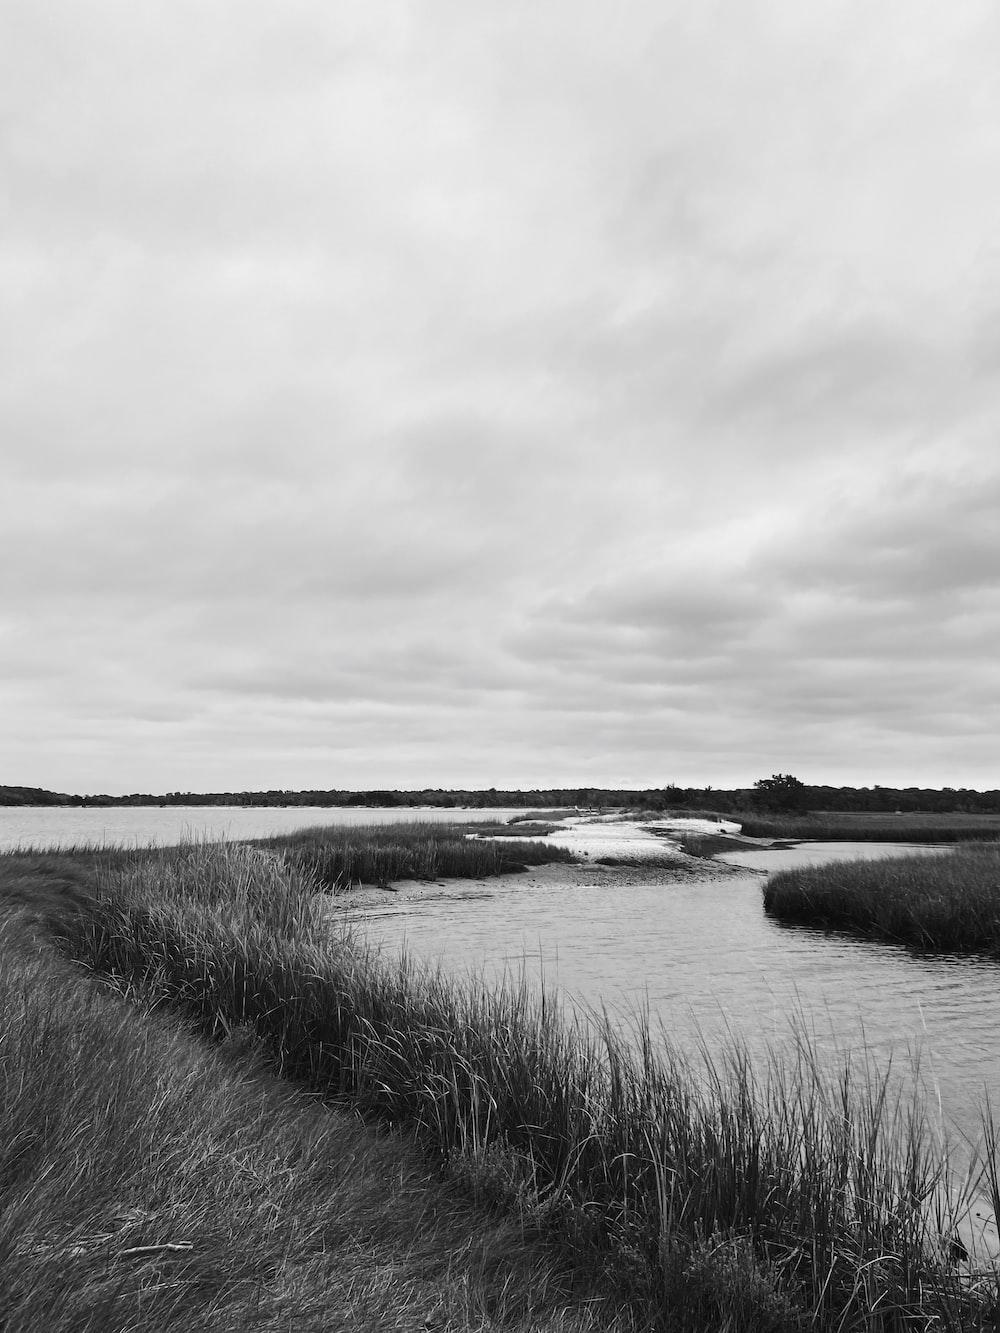 grayscale photo of body of water near grass field